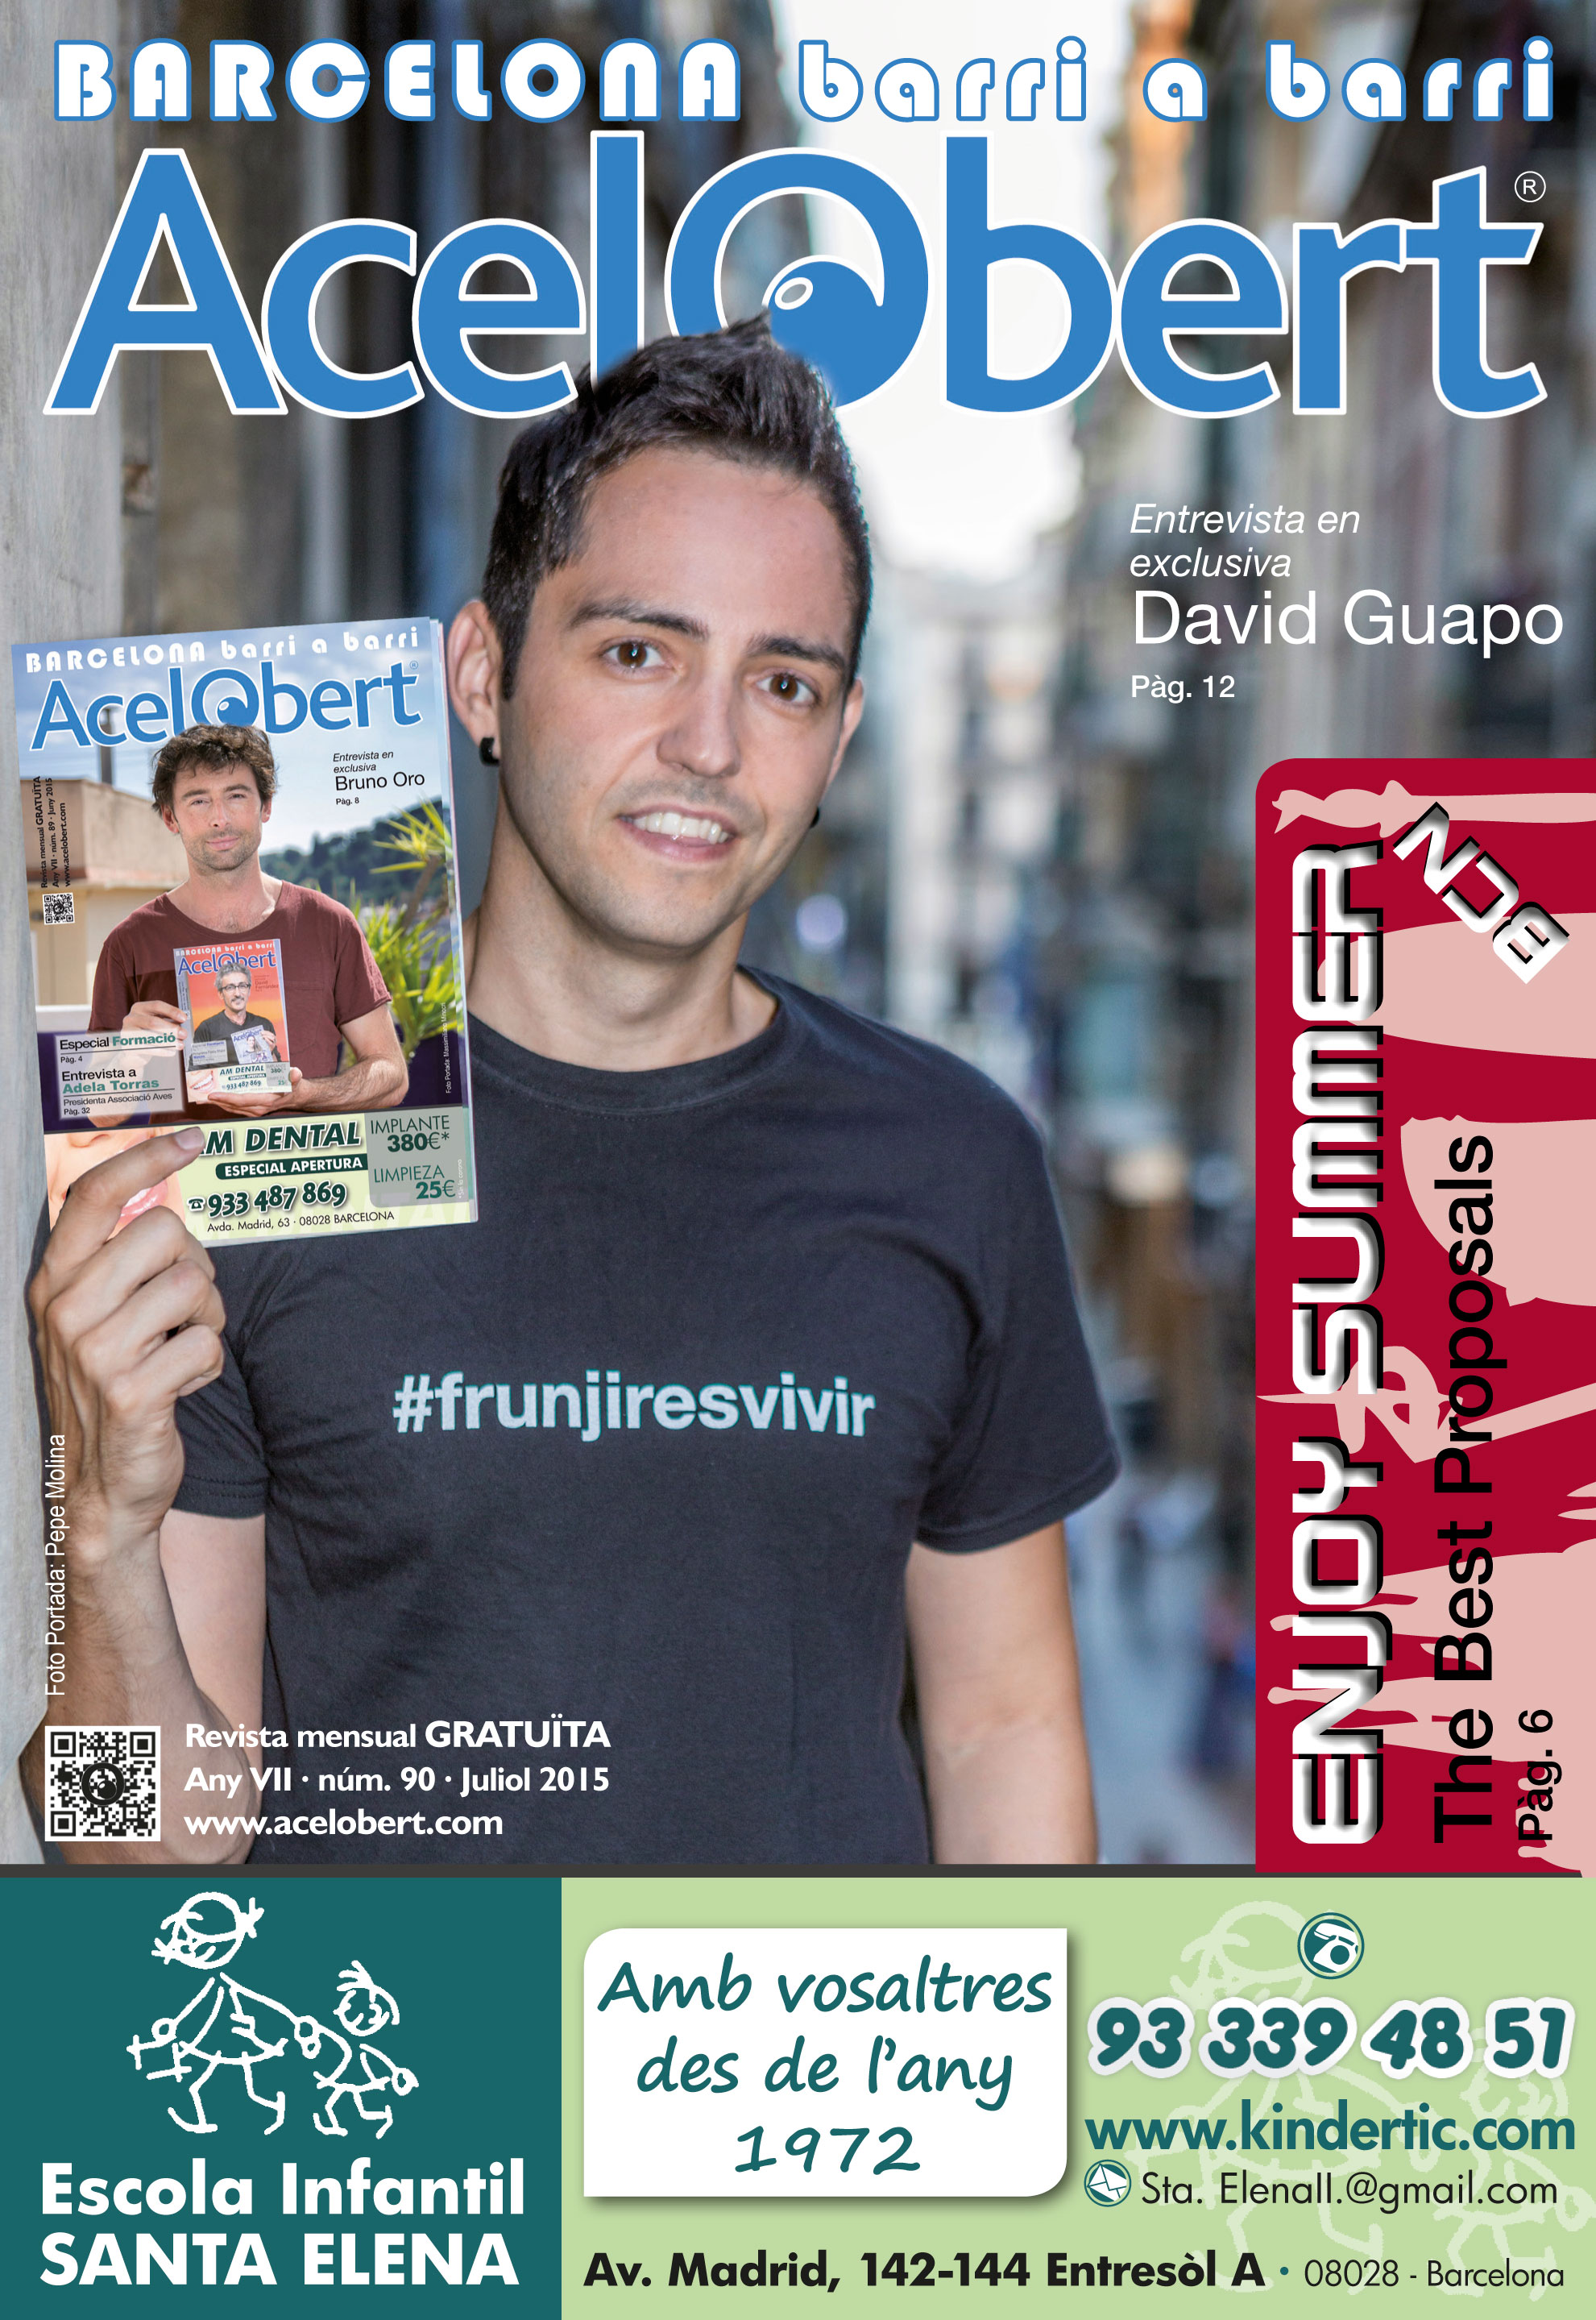 Acelobert Barcelona nº90 Juliol 2015